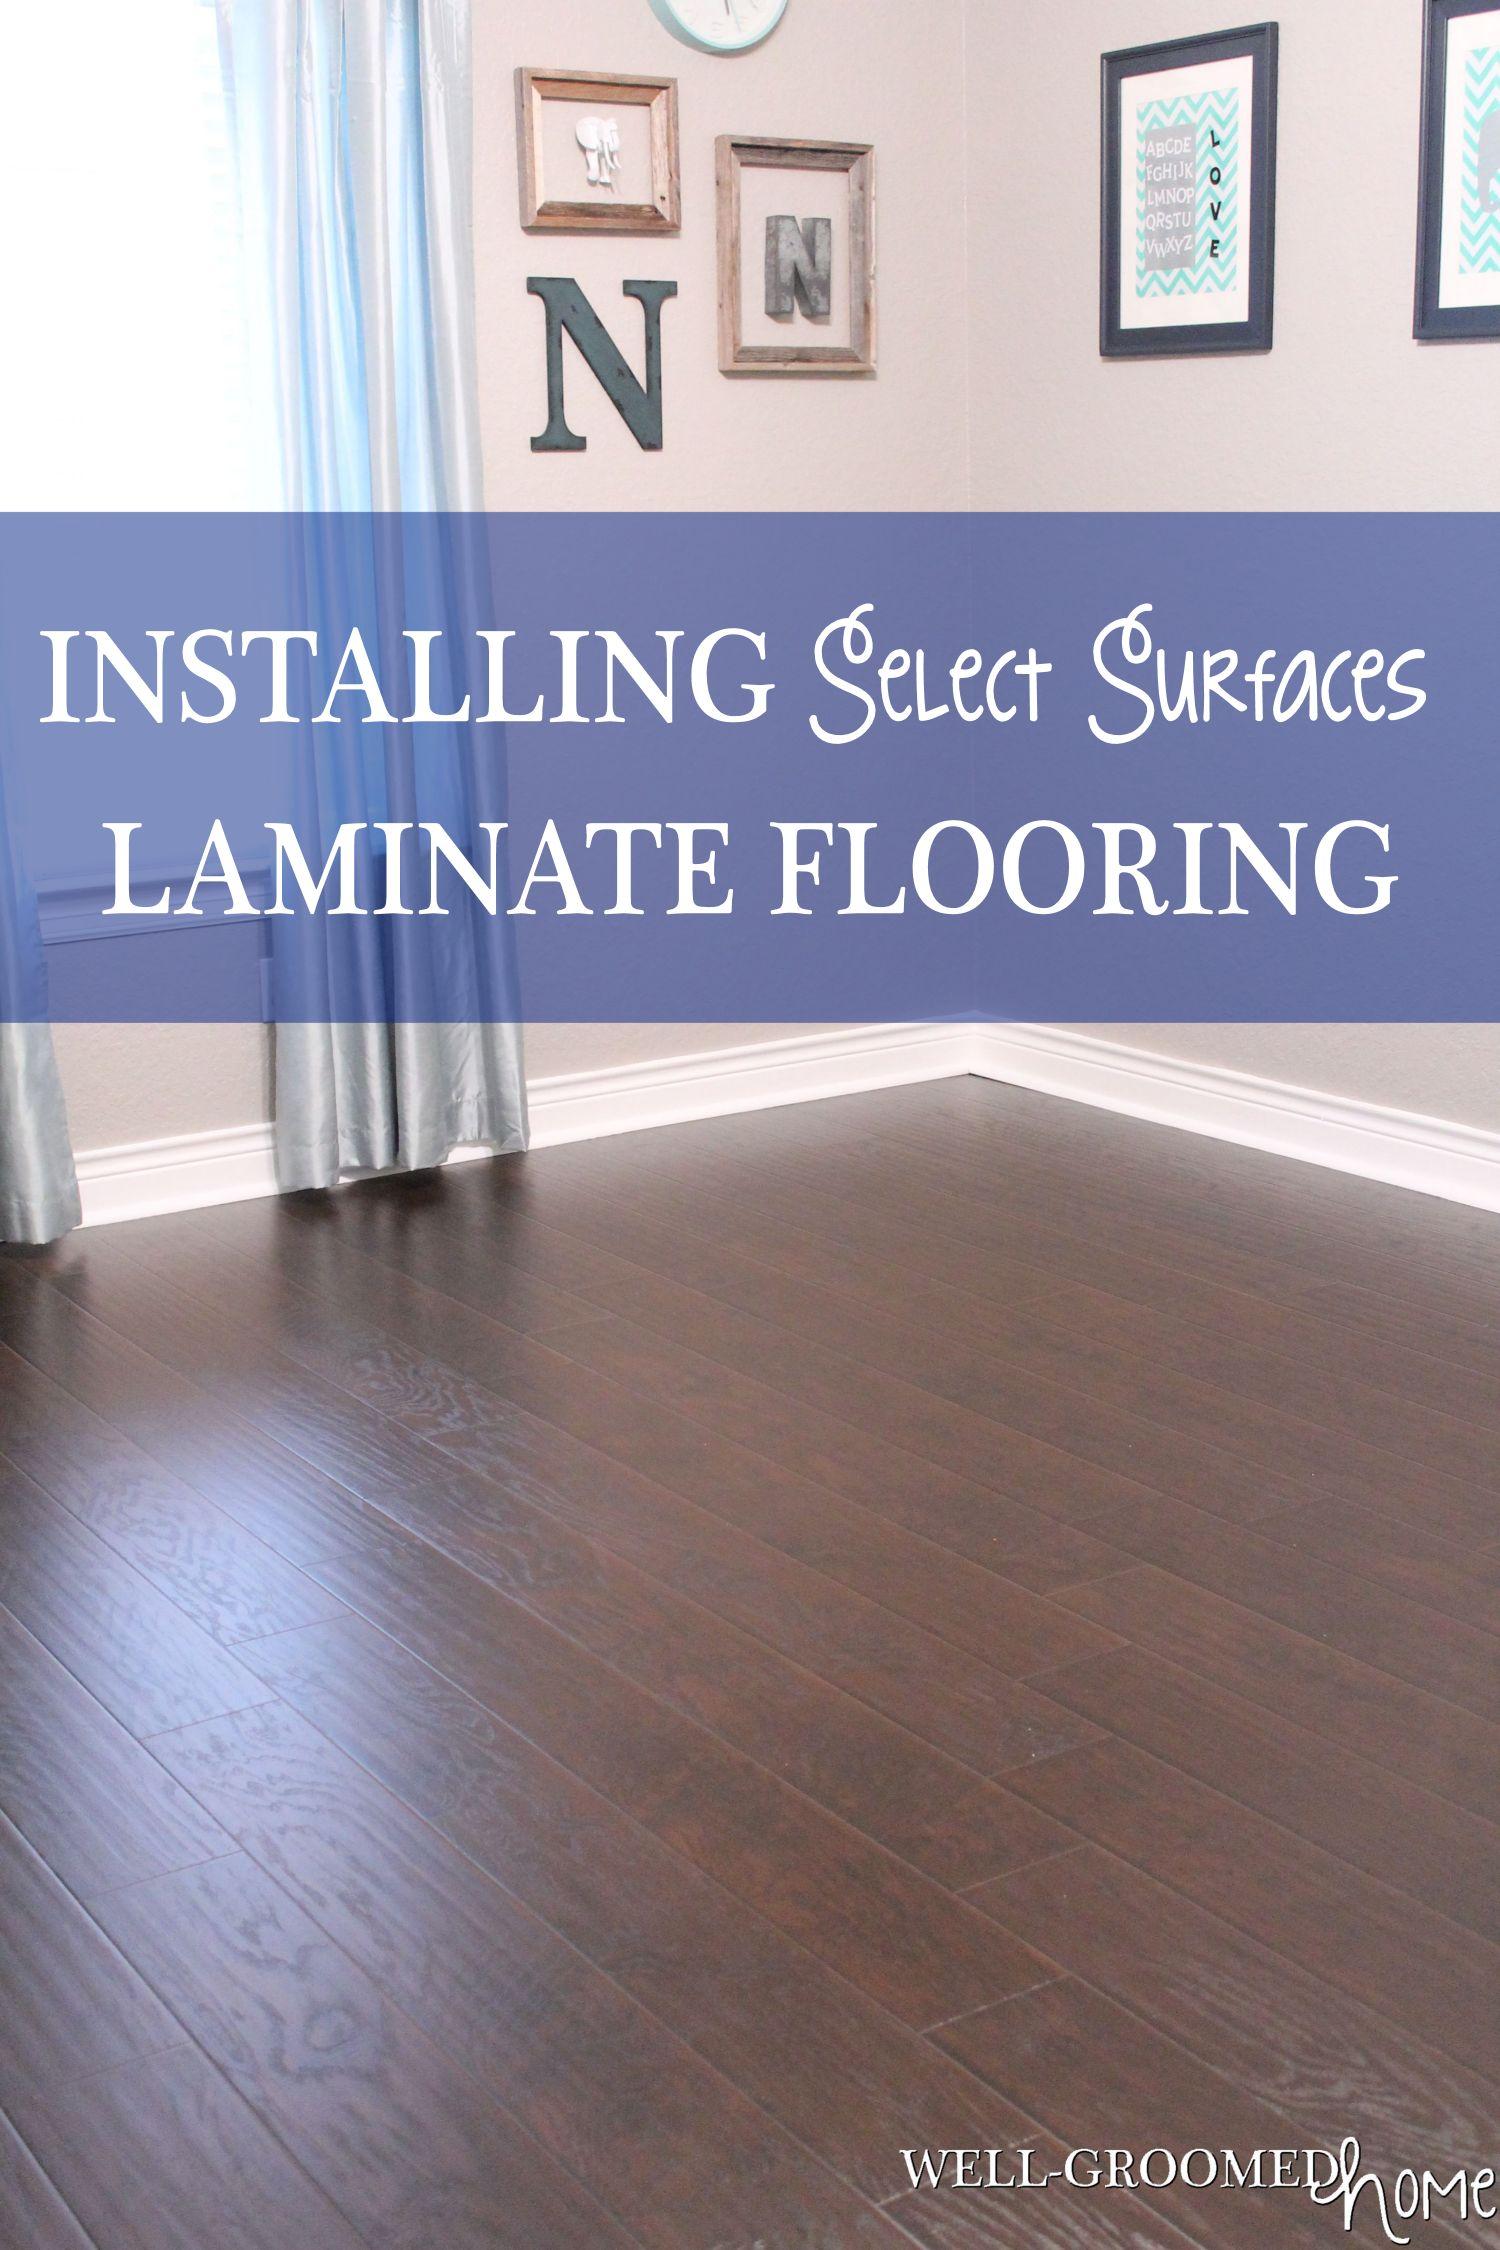 Select Surfaces Laminate Hardwood Flooring  WellGroomed Home